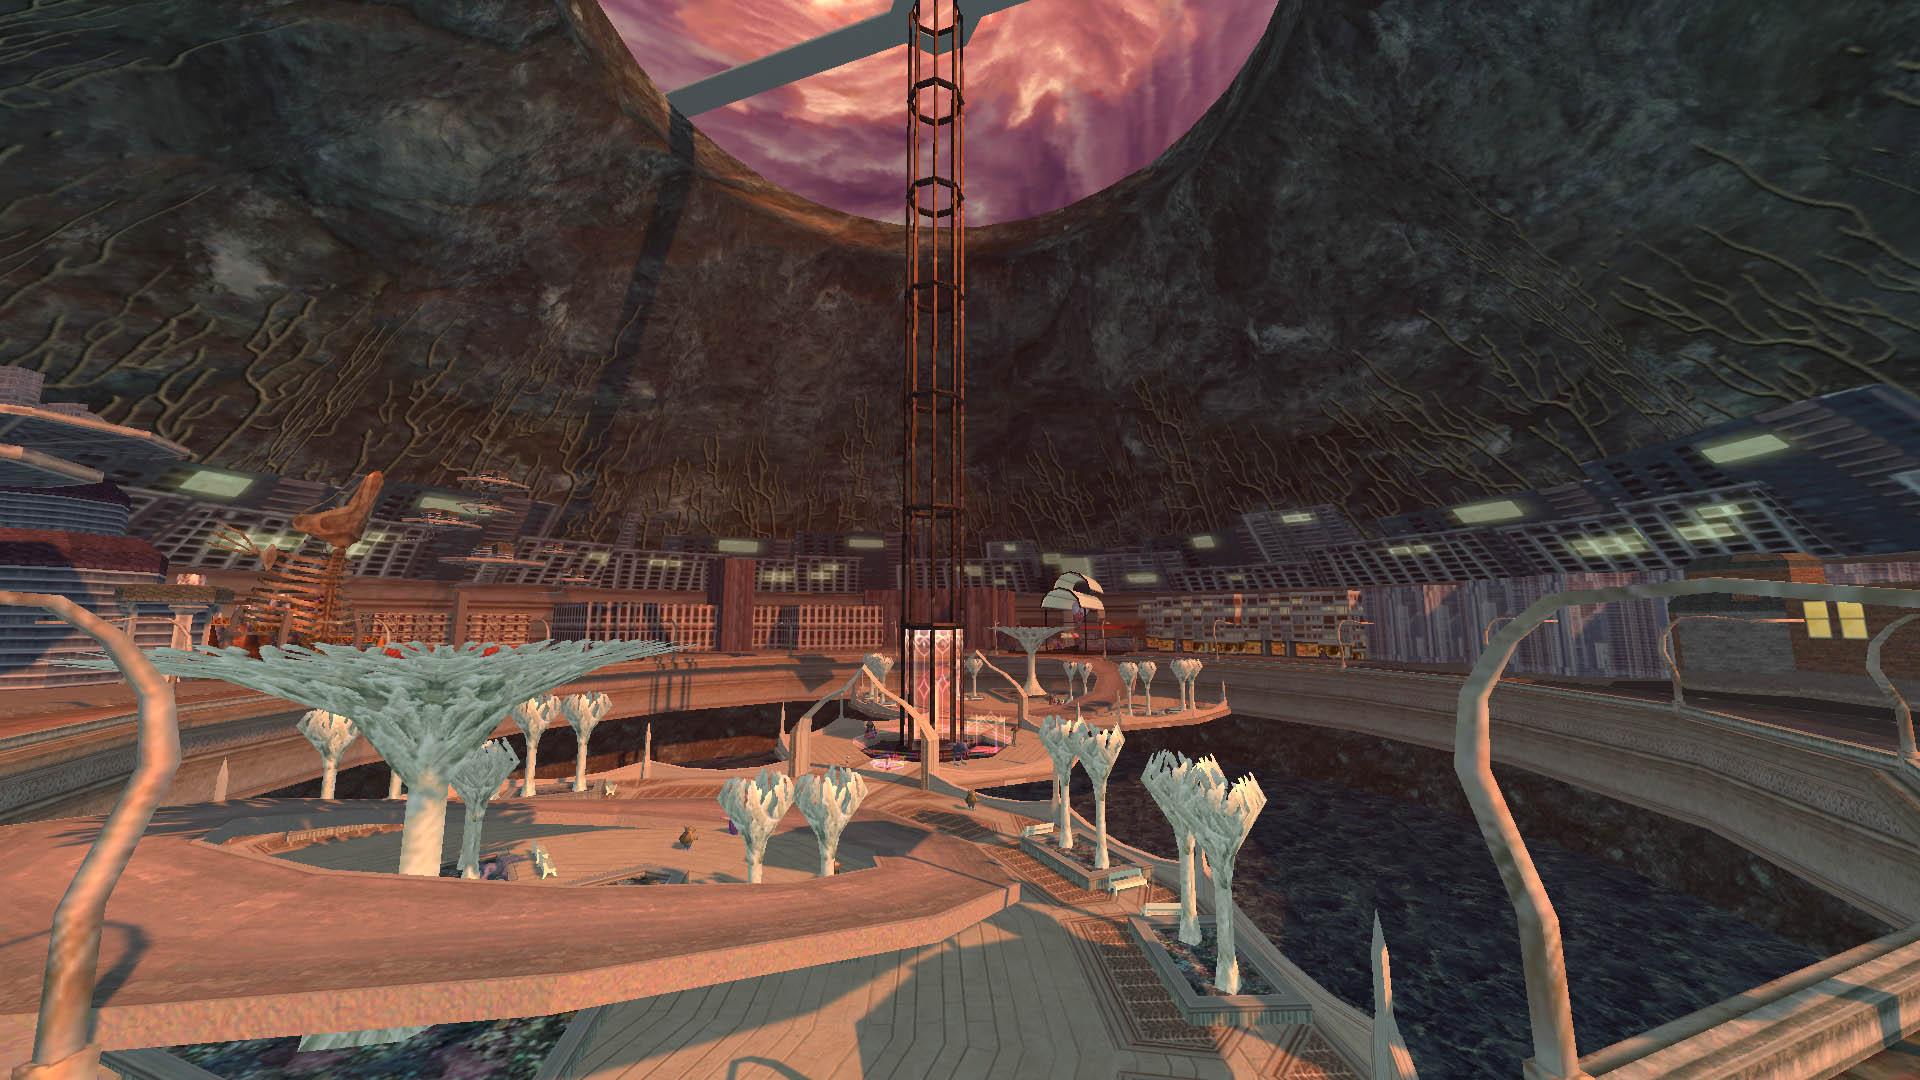 anodyne 2 return to dust game wallpaper 74205